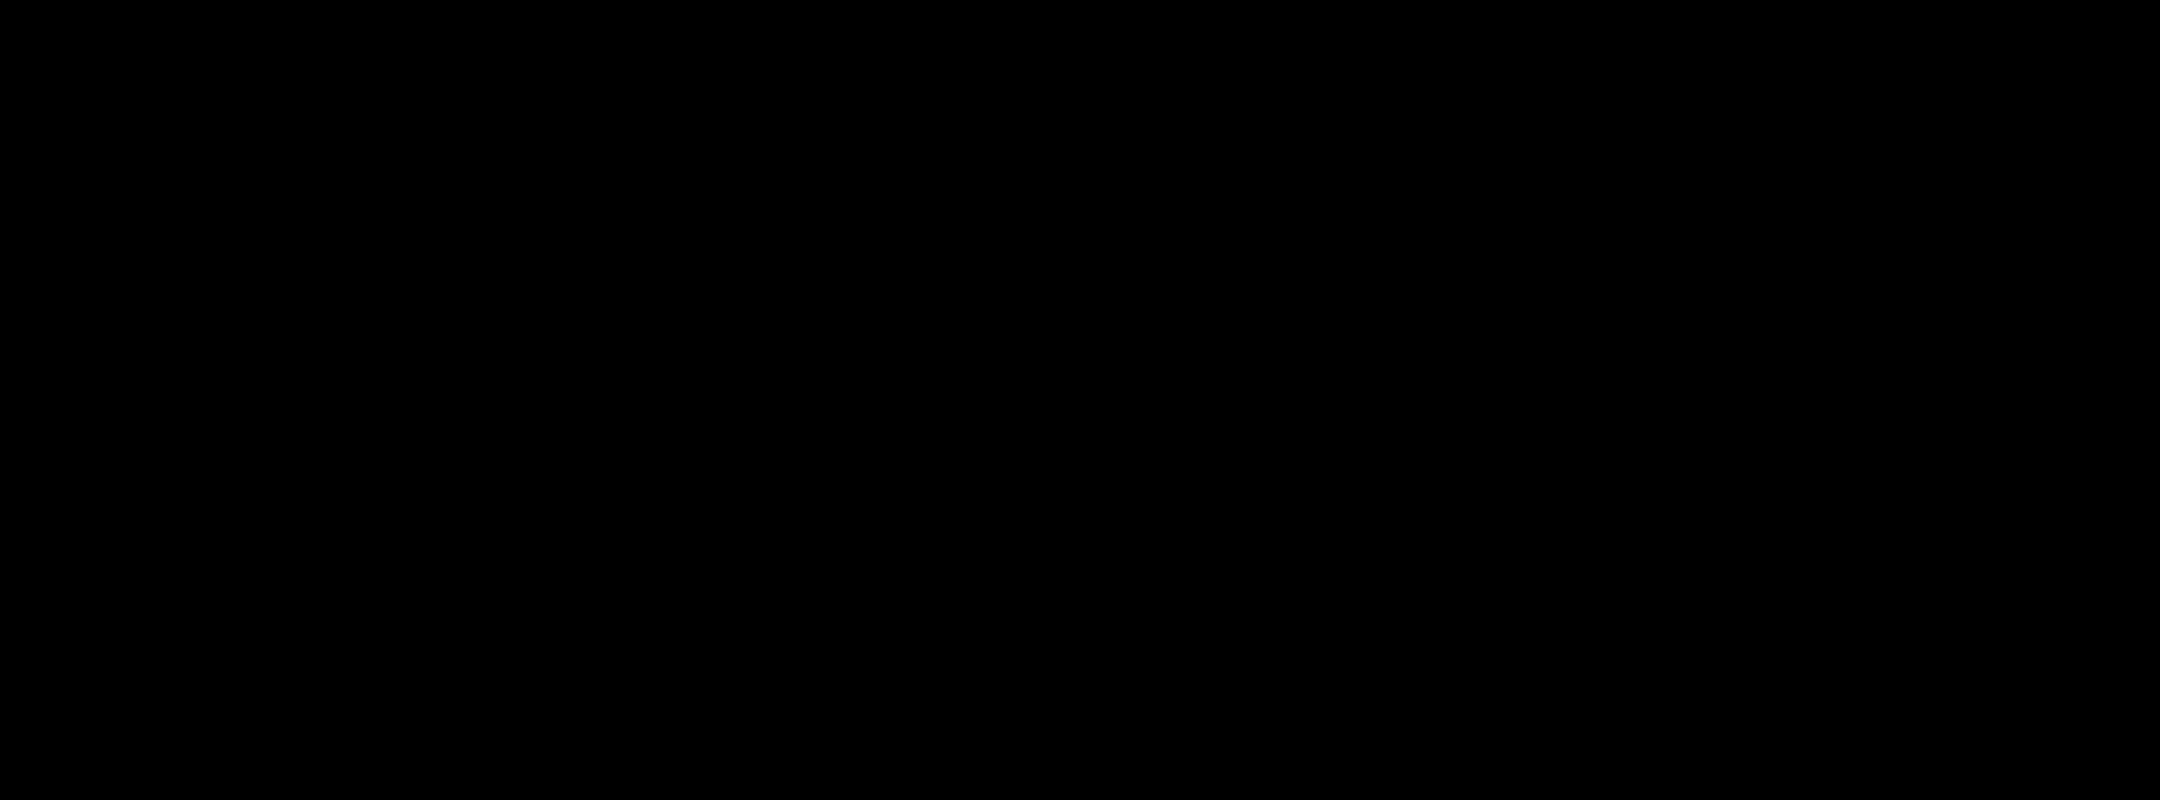 Tribetactics logo